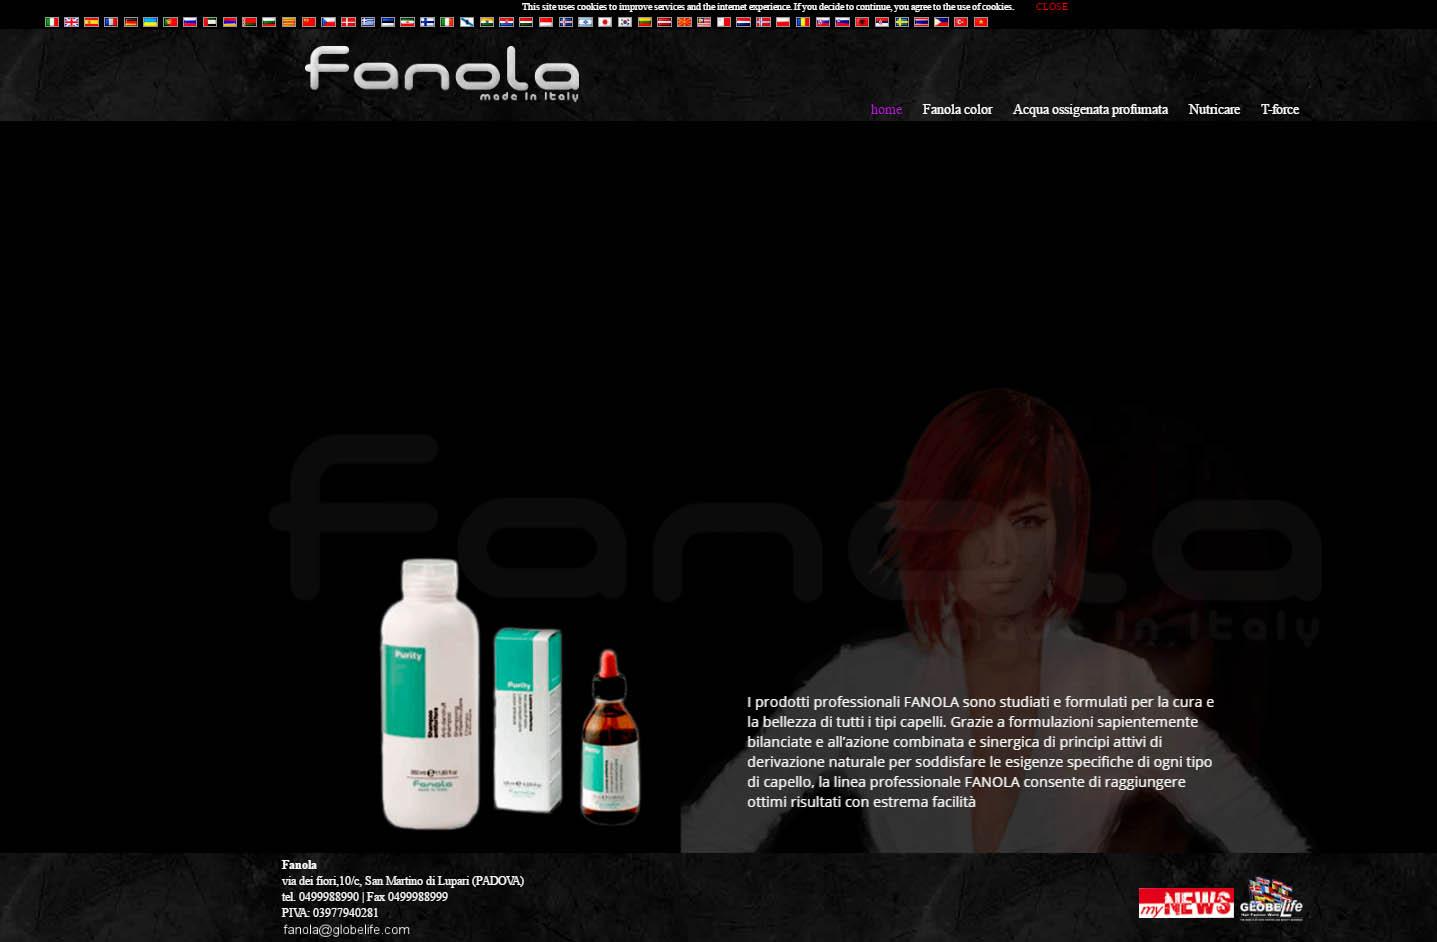 fanola-spot